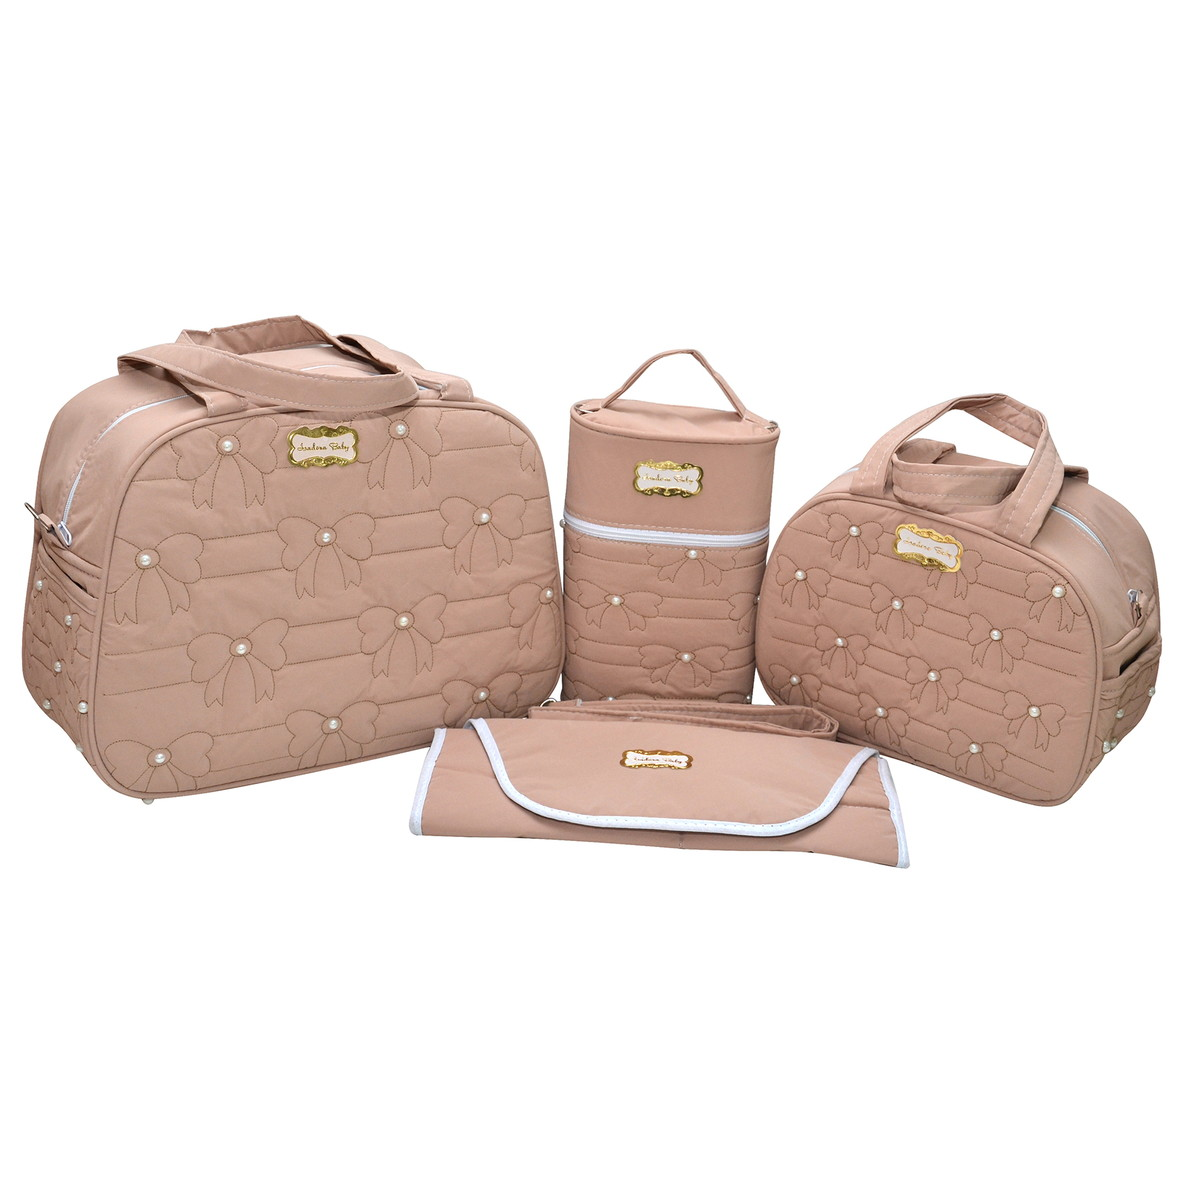 b45e4bc34 Kit bolsa maternidade menina 4 peçs luxo no Elo7 | Host Vendas (B532F1)